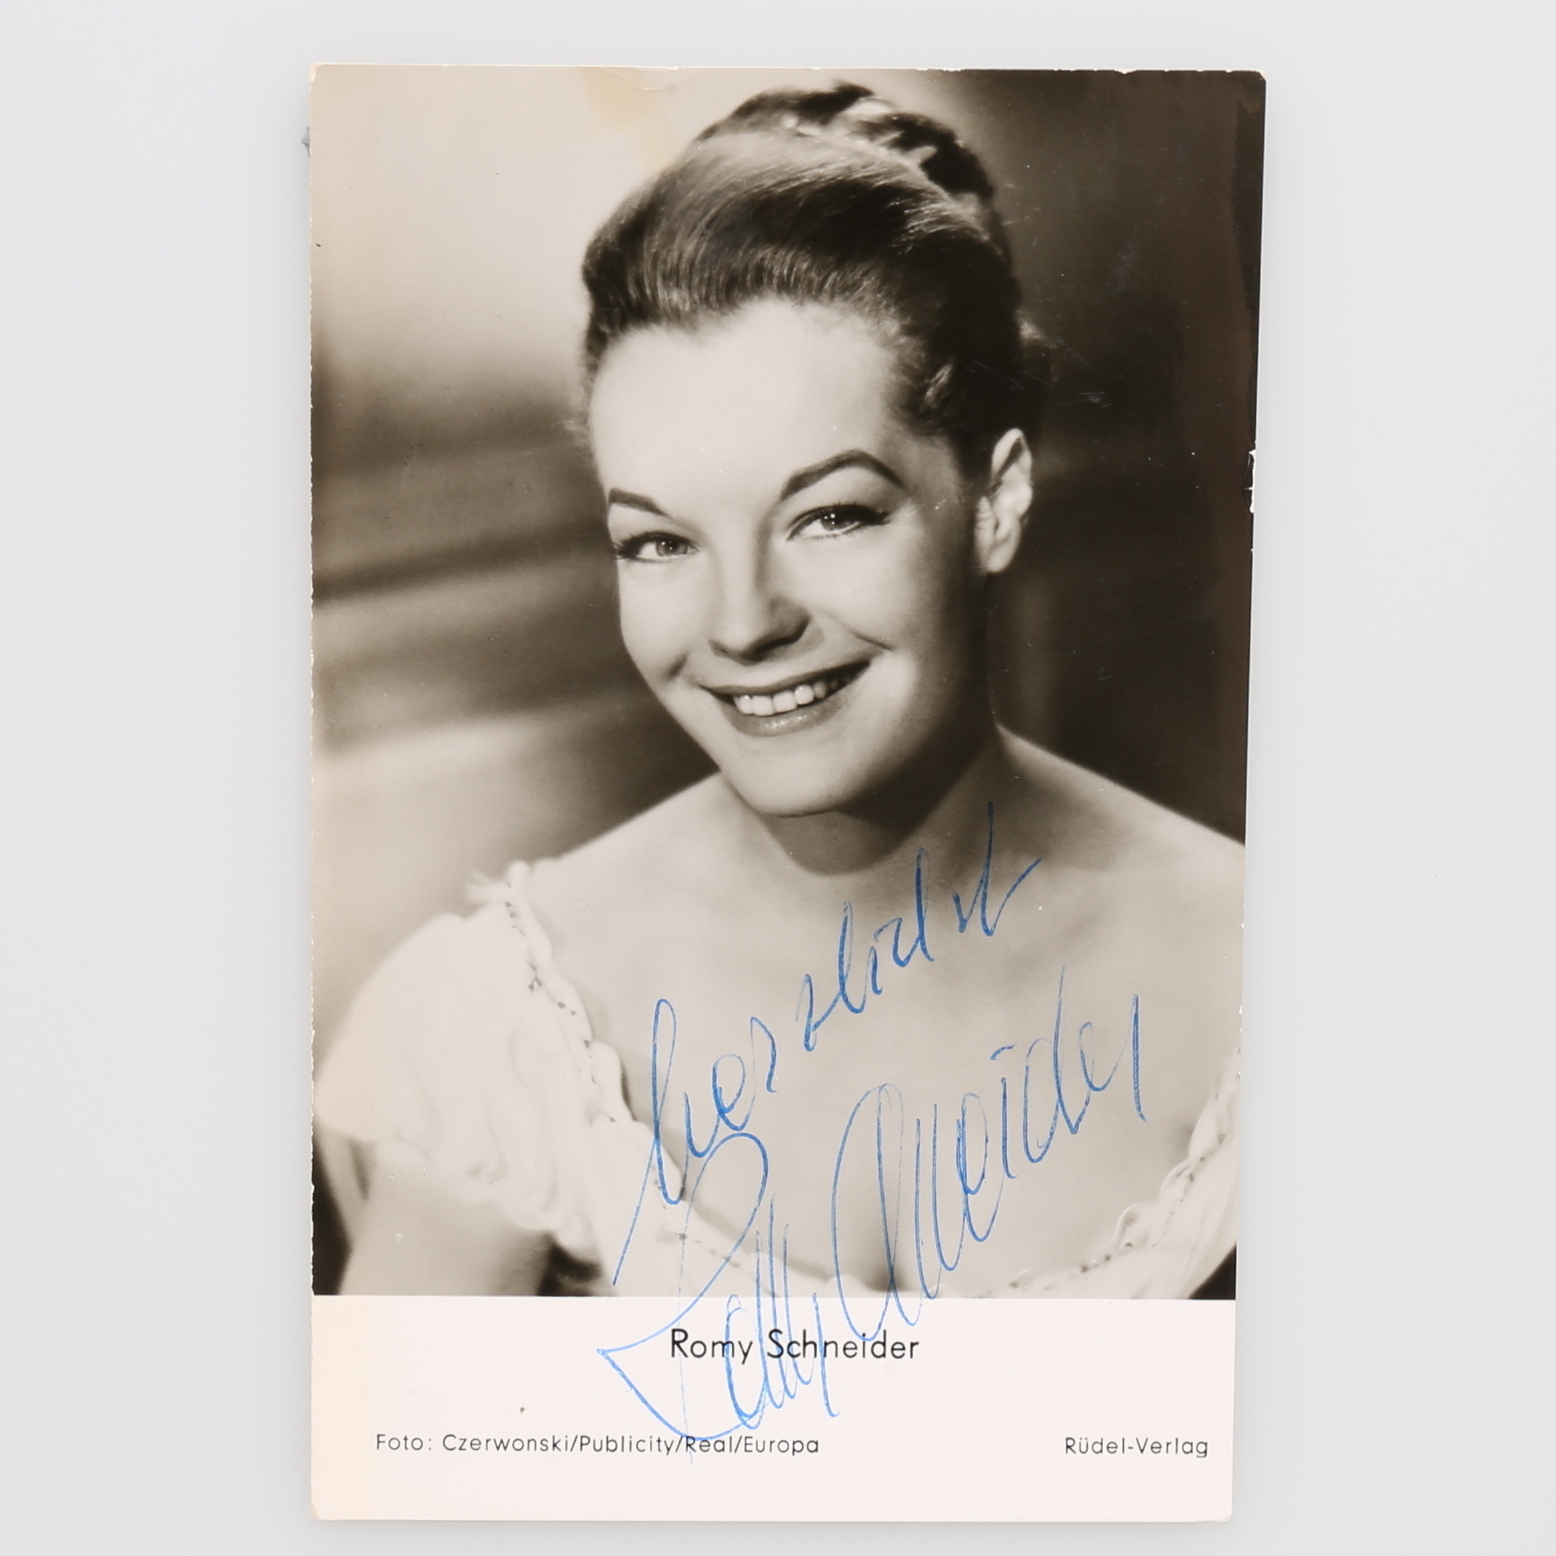 Autograph Romy Schneider Austria French Show Player 1938 1982 Books Maps Manuscripts Auctionet